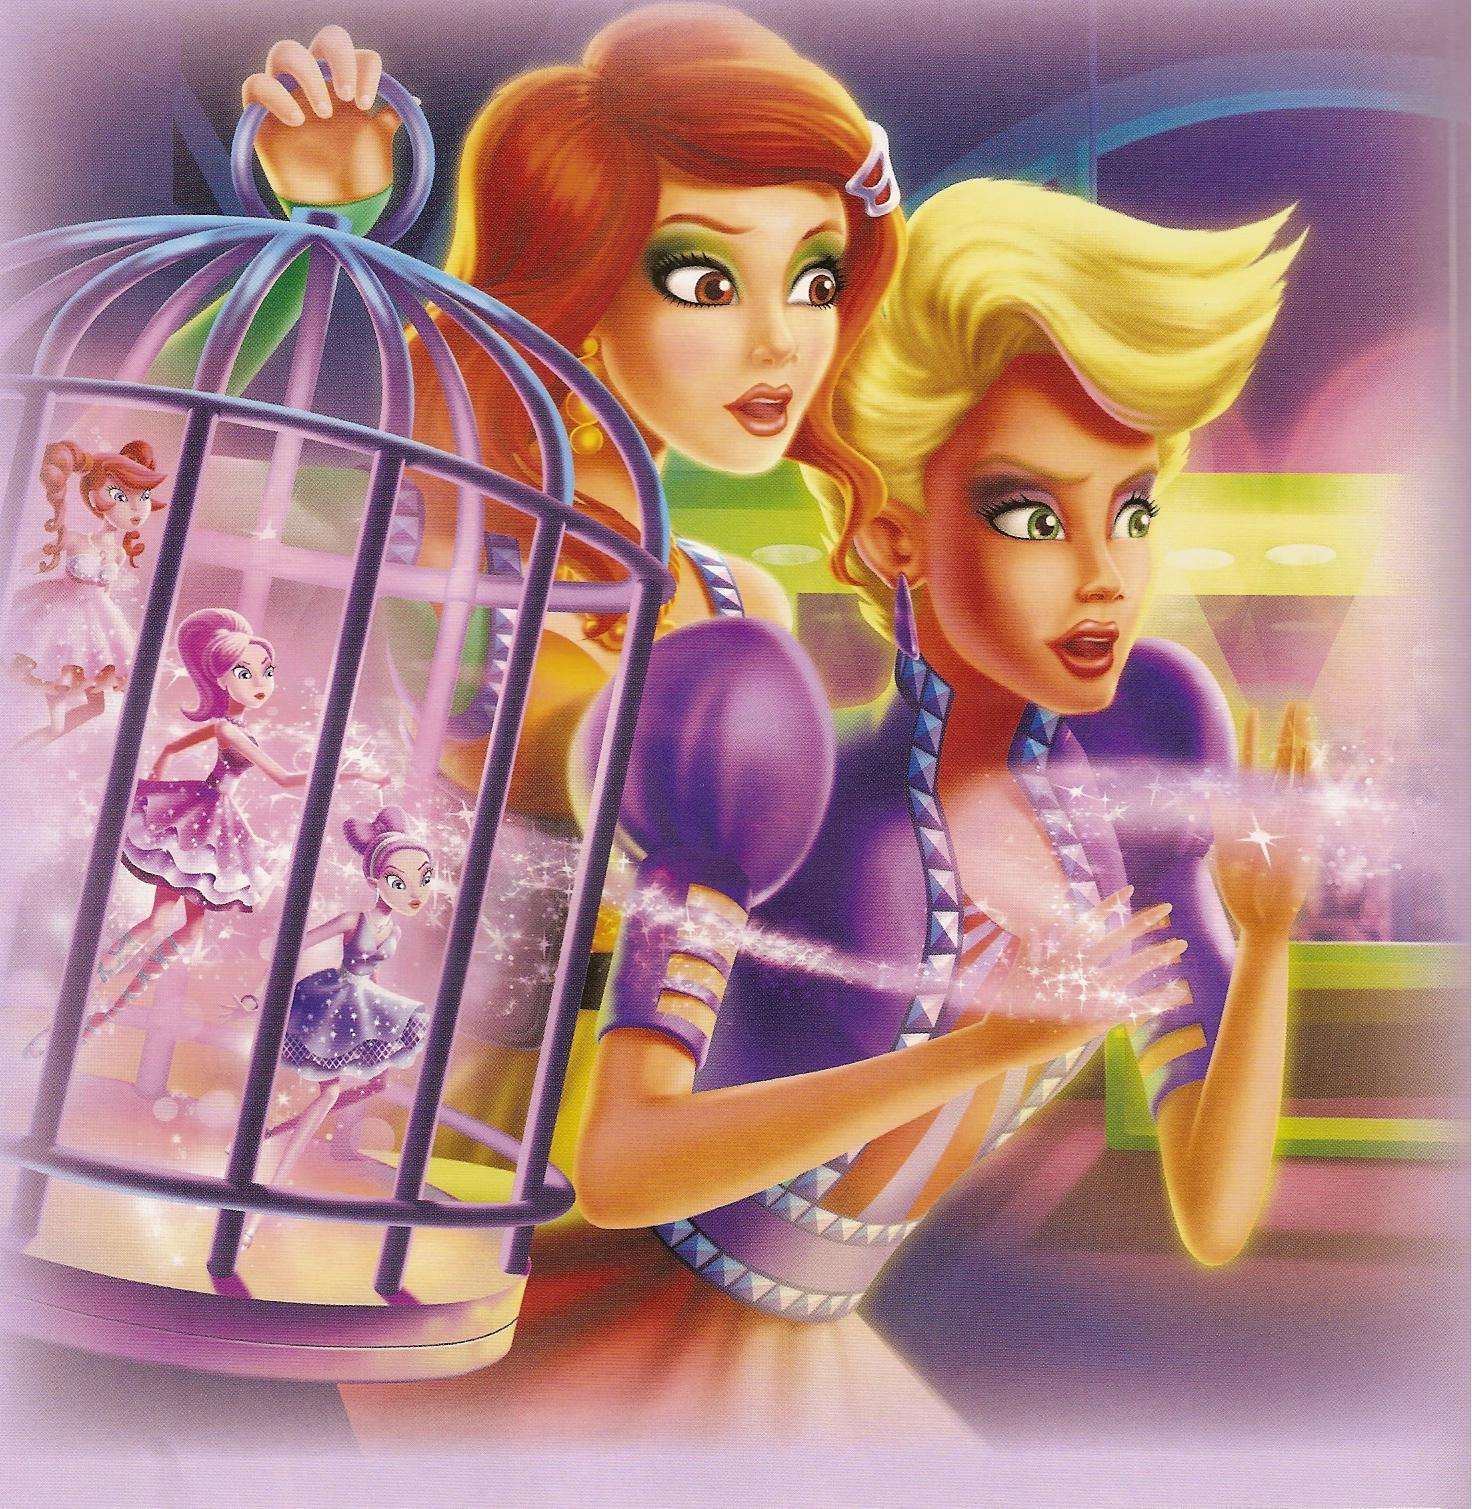 Barbie fashion fairytale images a fashion fairytale hd wallpaper and